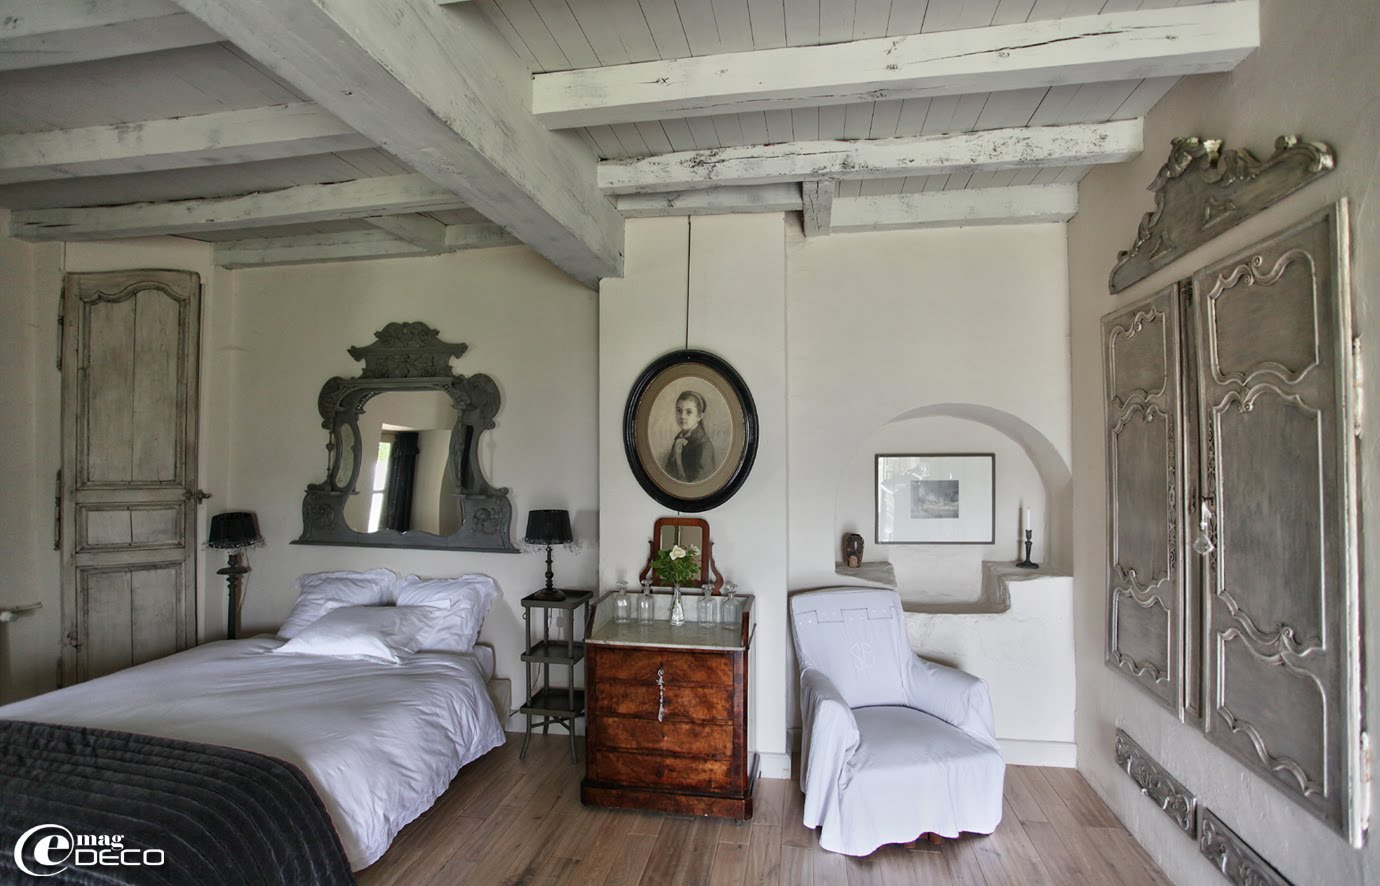 D cor de provence needing a vacation for Poutre decorative plafond